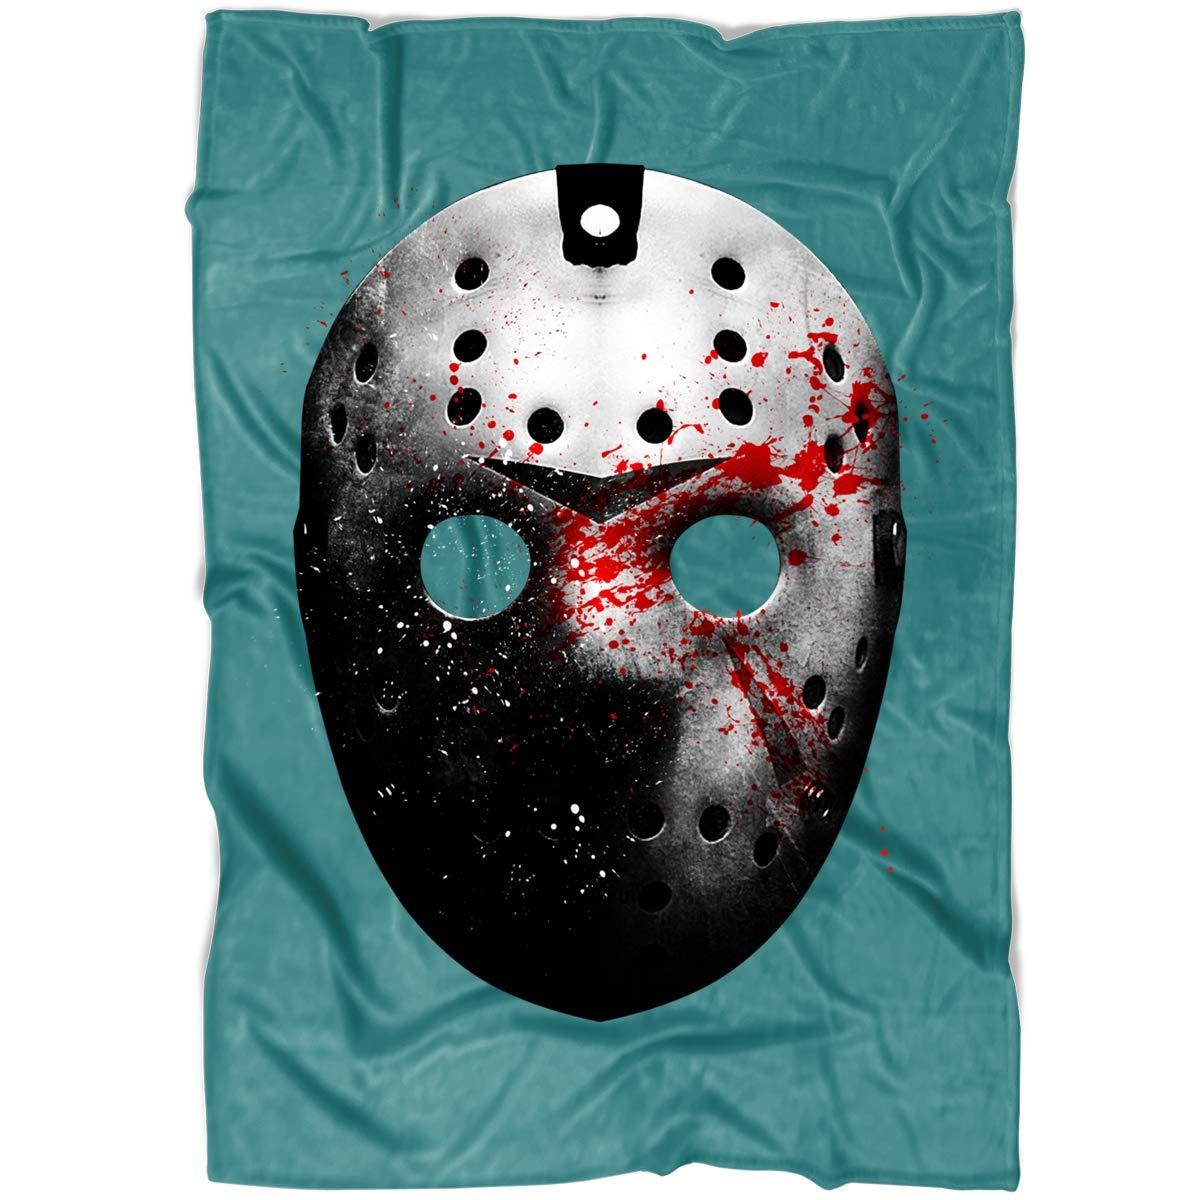 Amazon.com: LEXIGSTORE Freddy Krueger Mask Soft Fleece Throw ...